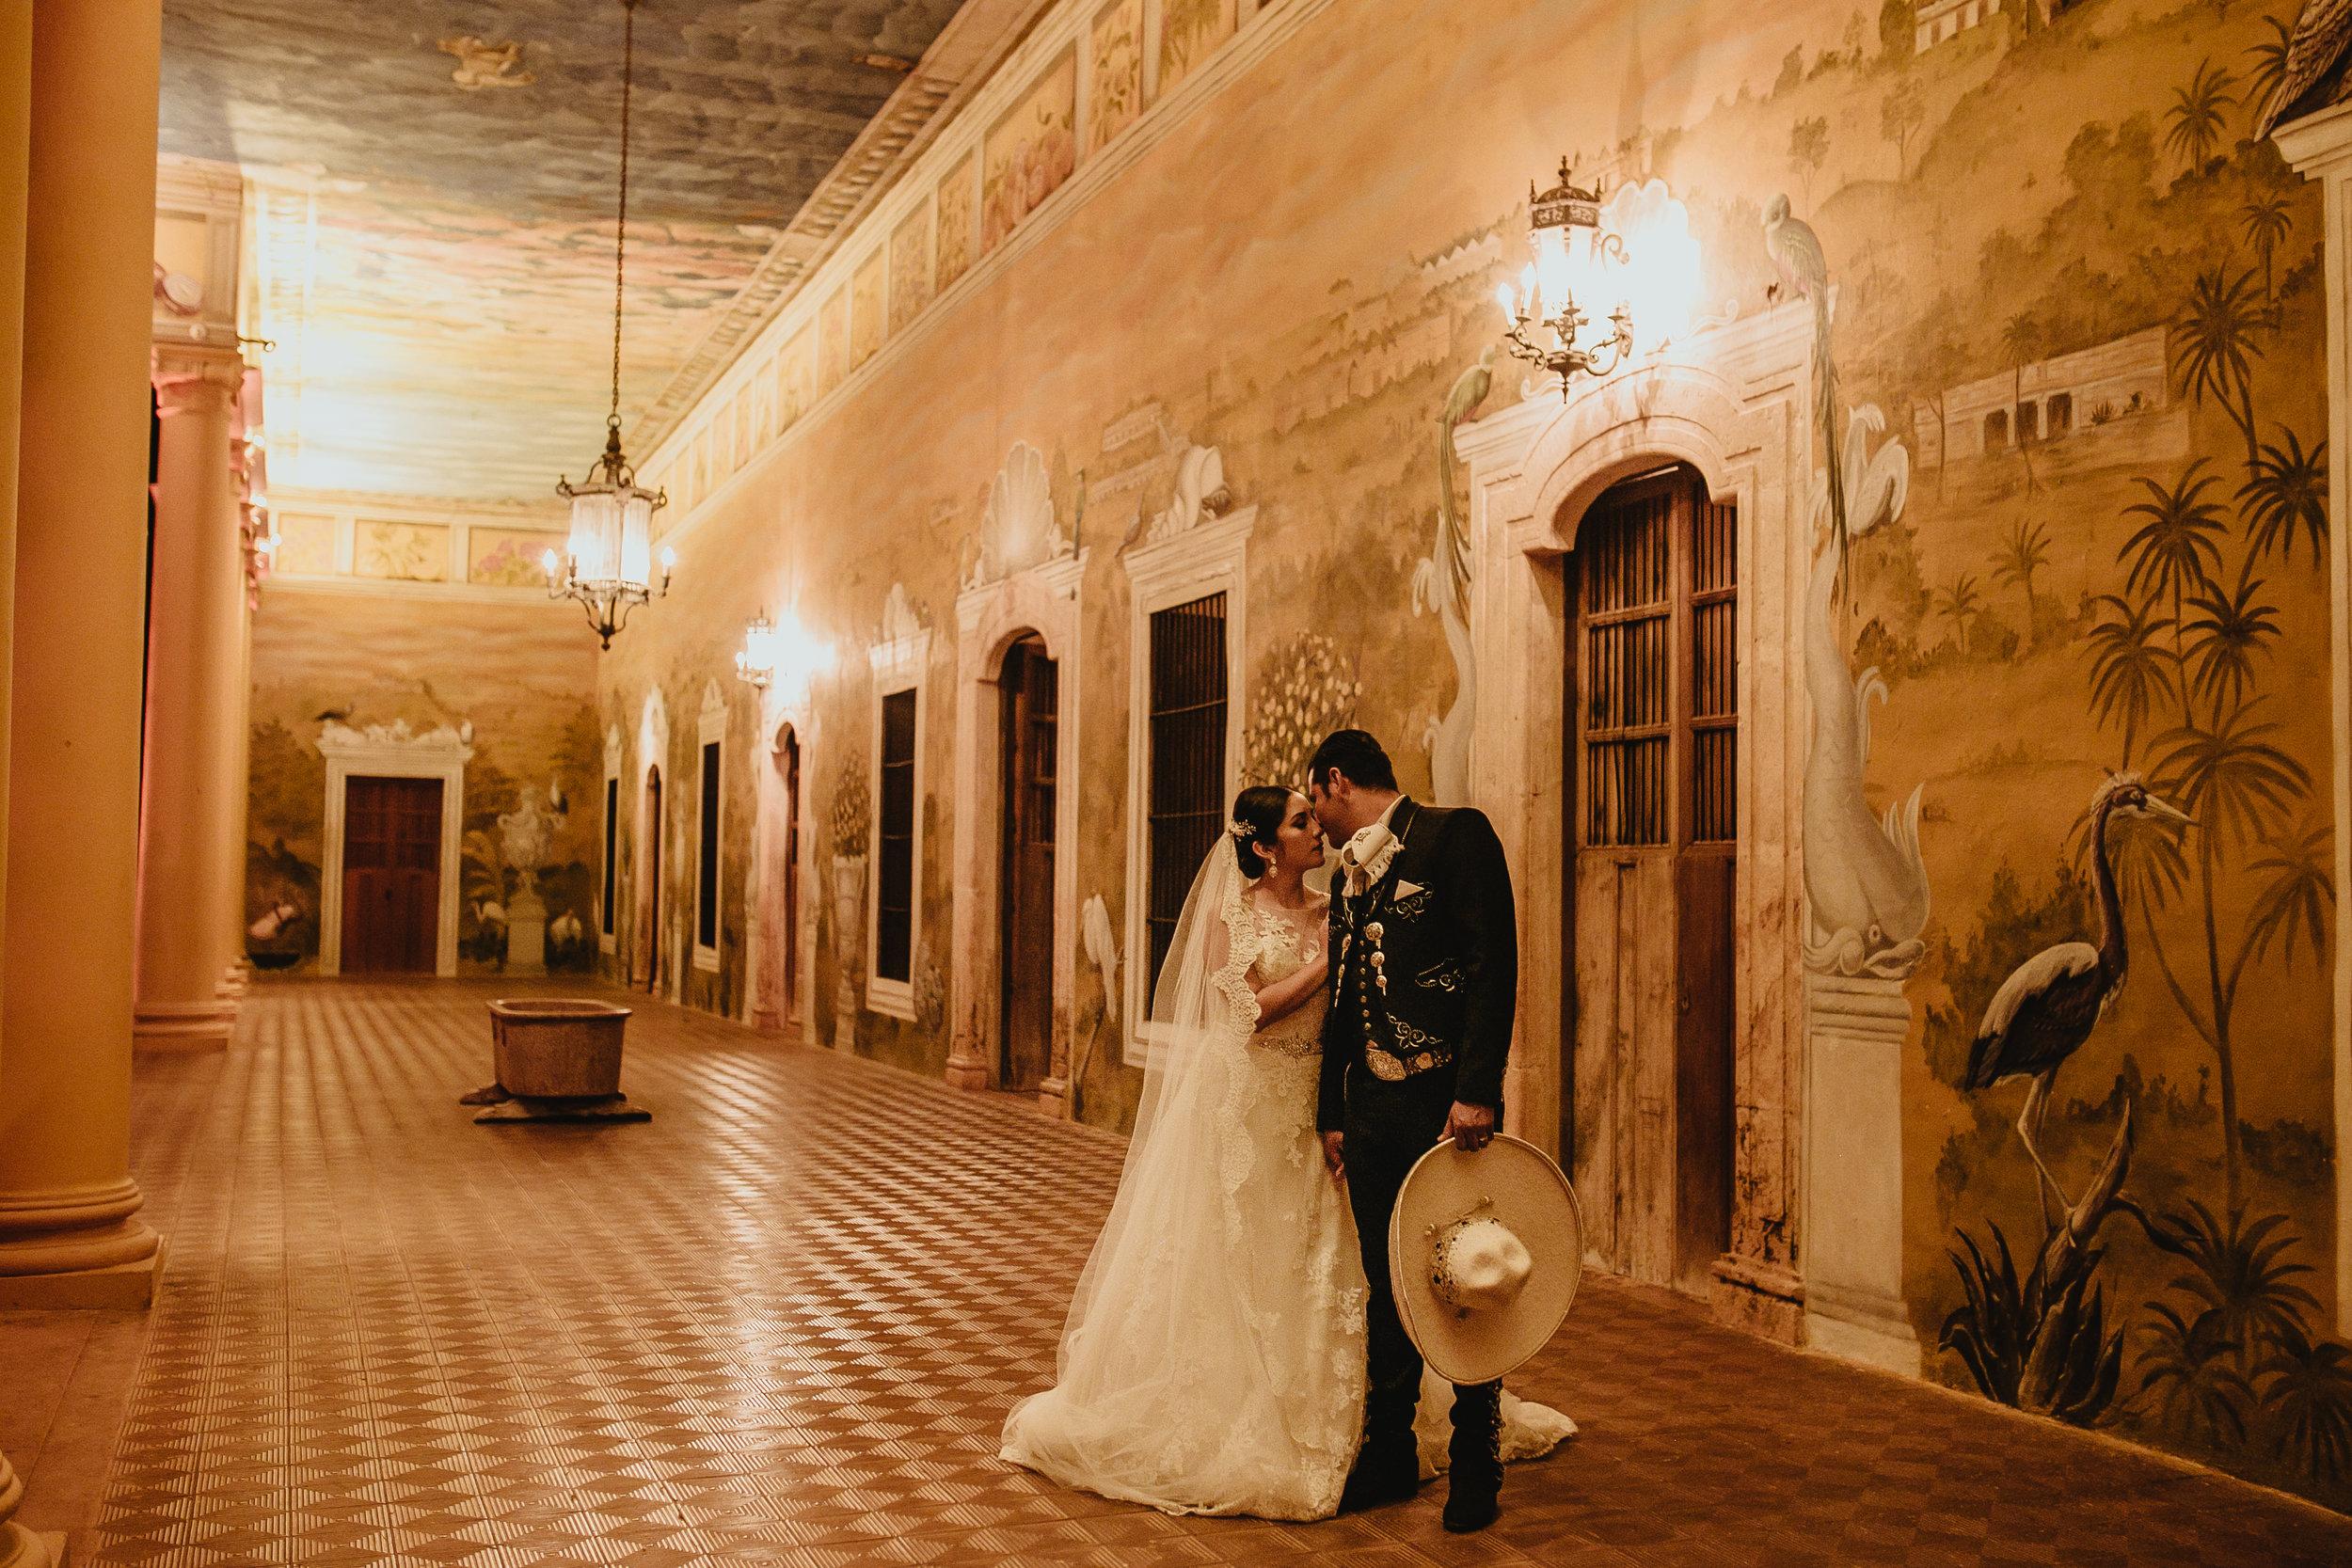 0330E&ARslide_HaciendaTekikDeRegil_WeddingDstination_MeridaYucatan_HaciendasMerida_BodasMexico_BodasYucatan_Boda_Destino.jpg